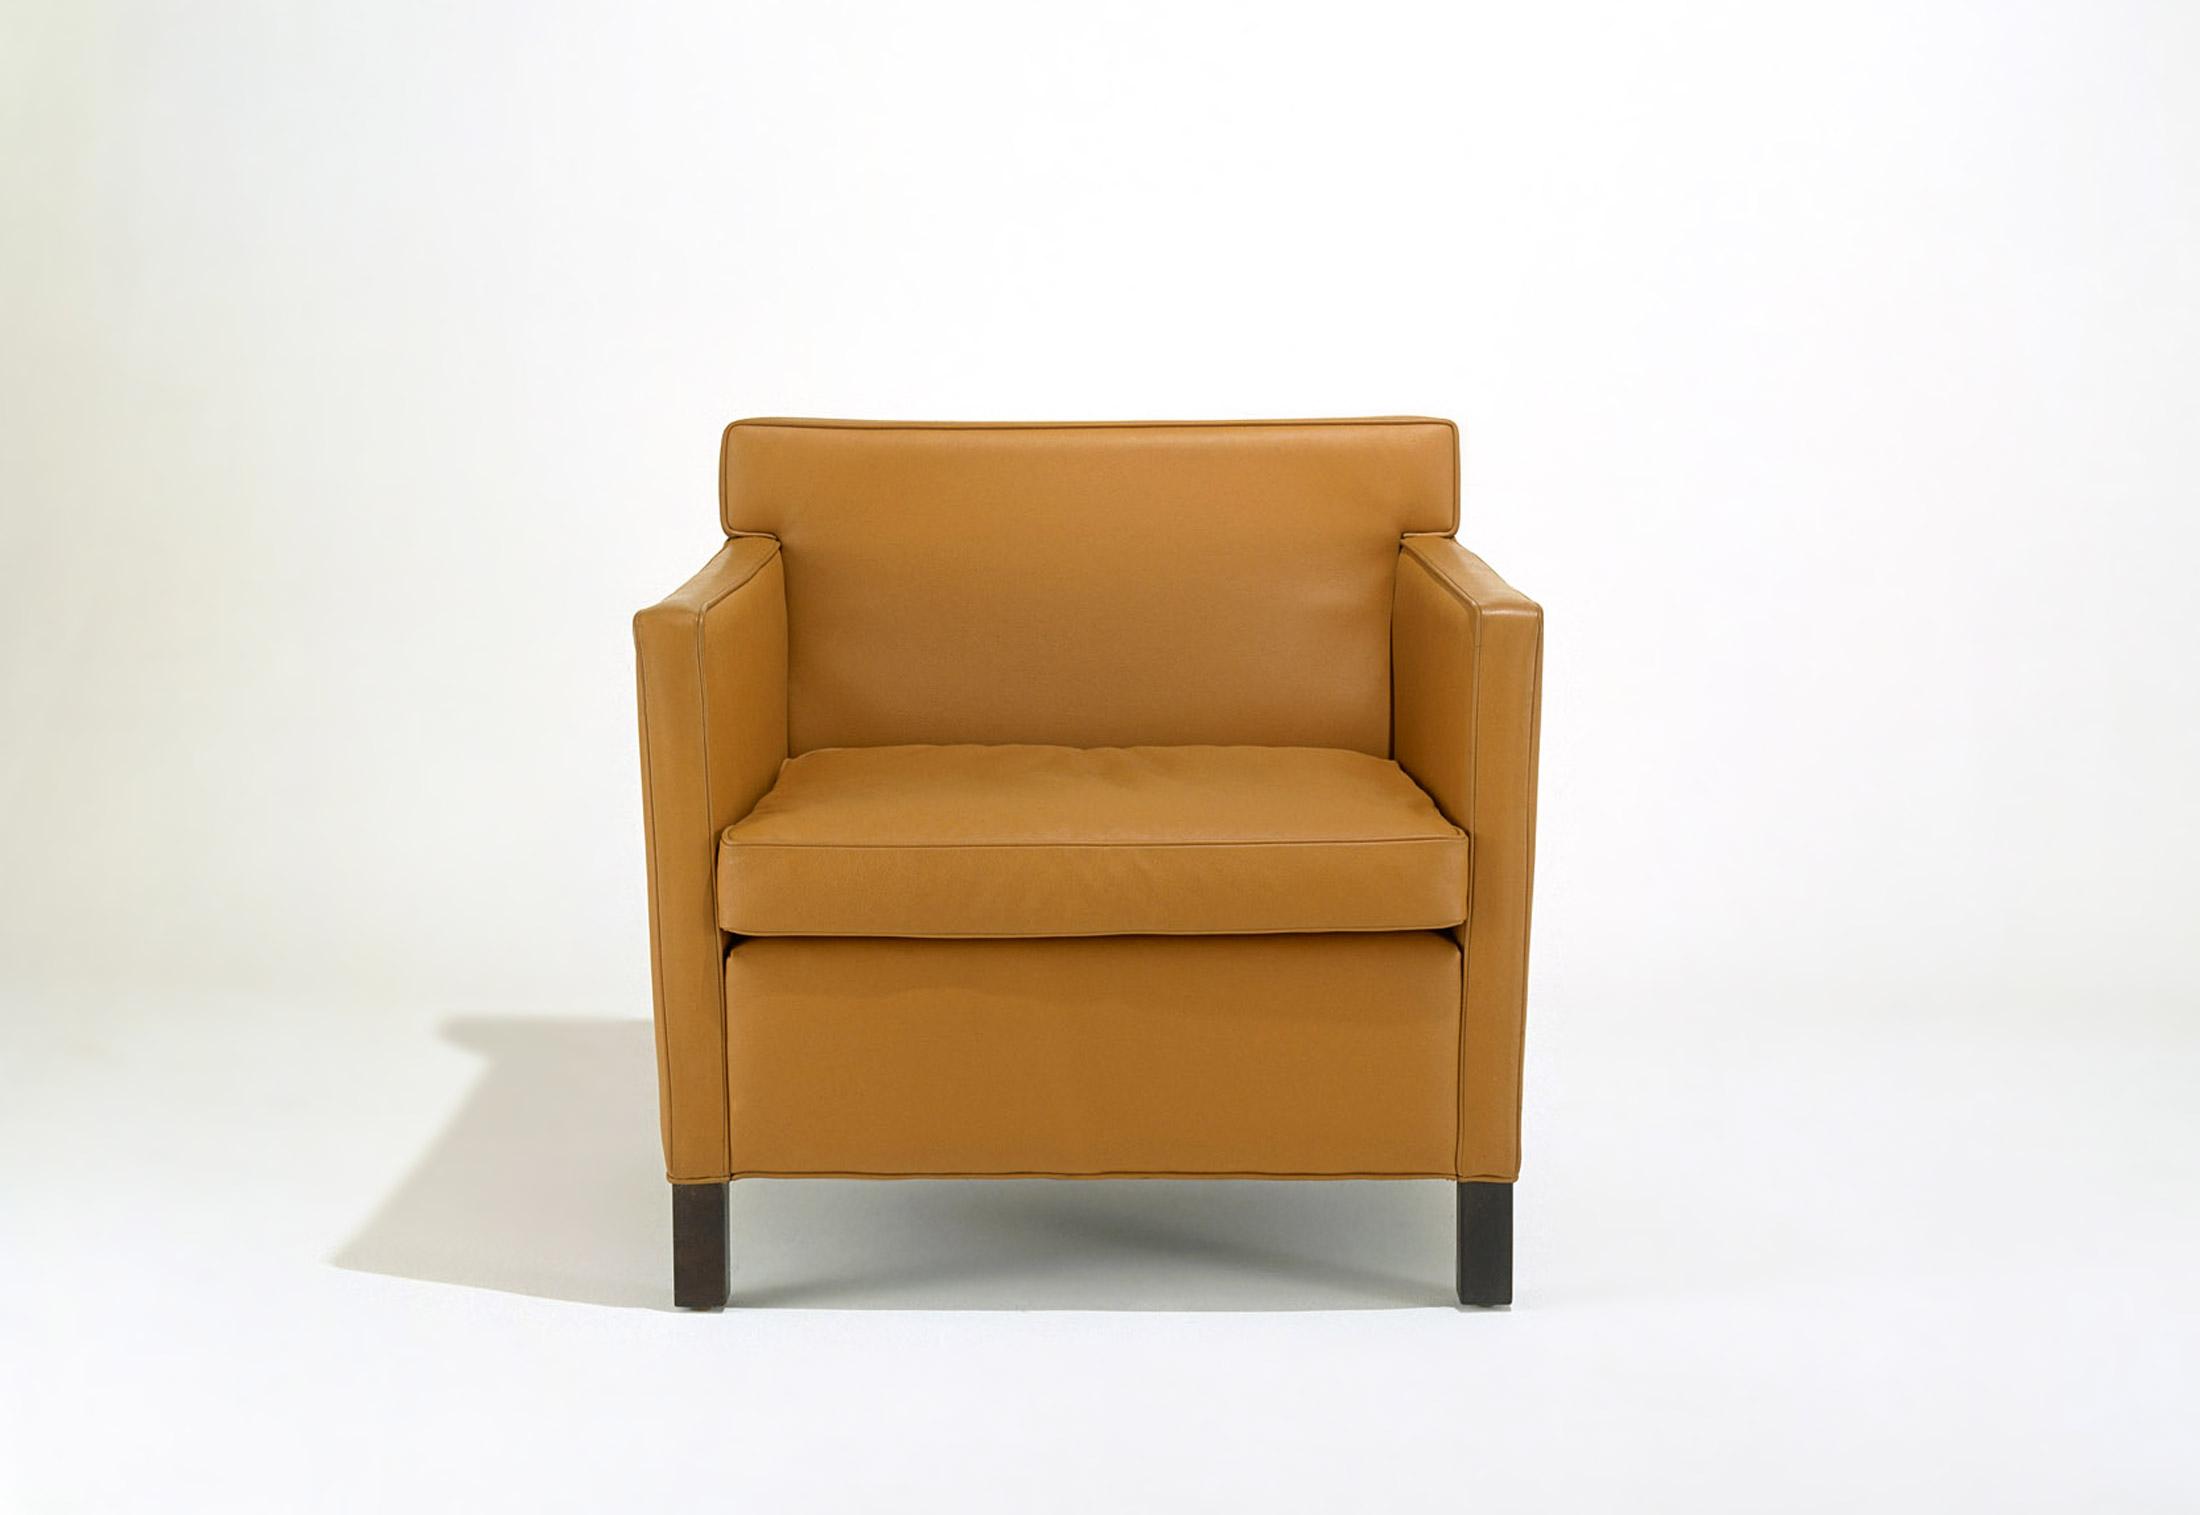 krefeld sessel von knoll stylepark. Black Bedroom Furniture Sets. Home Design Ideas